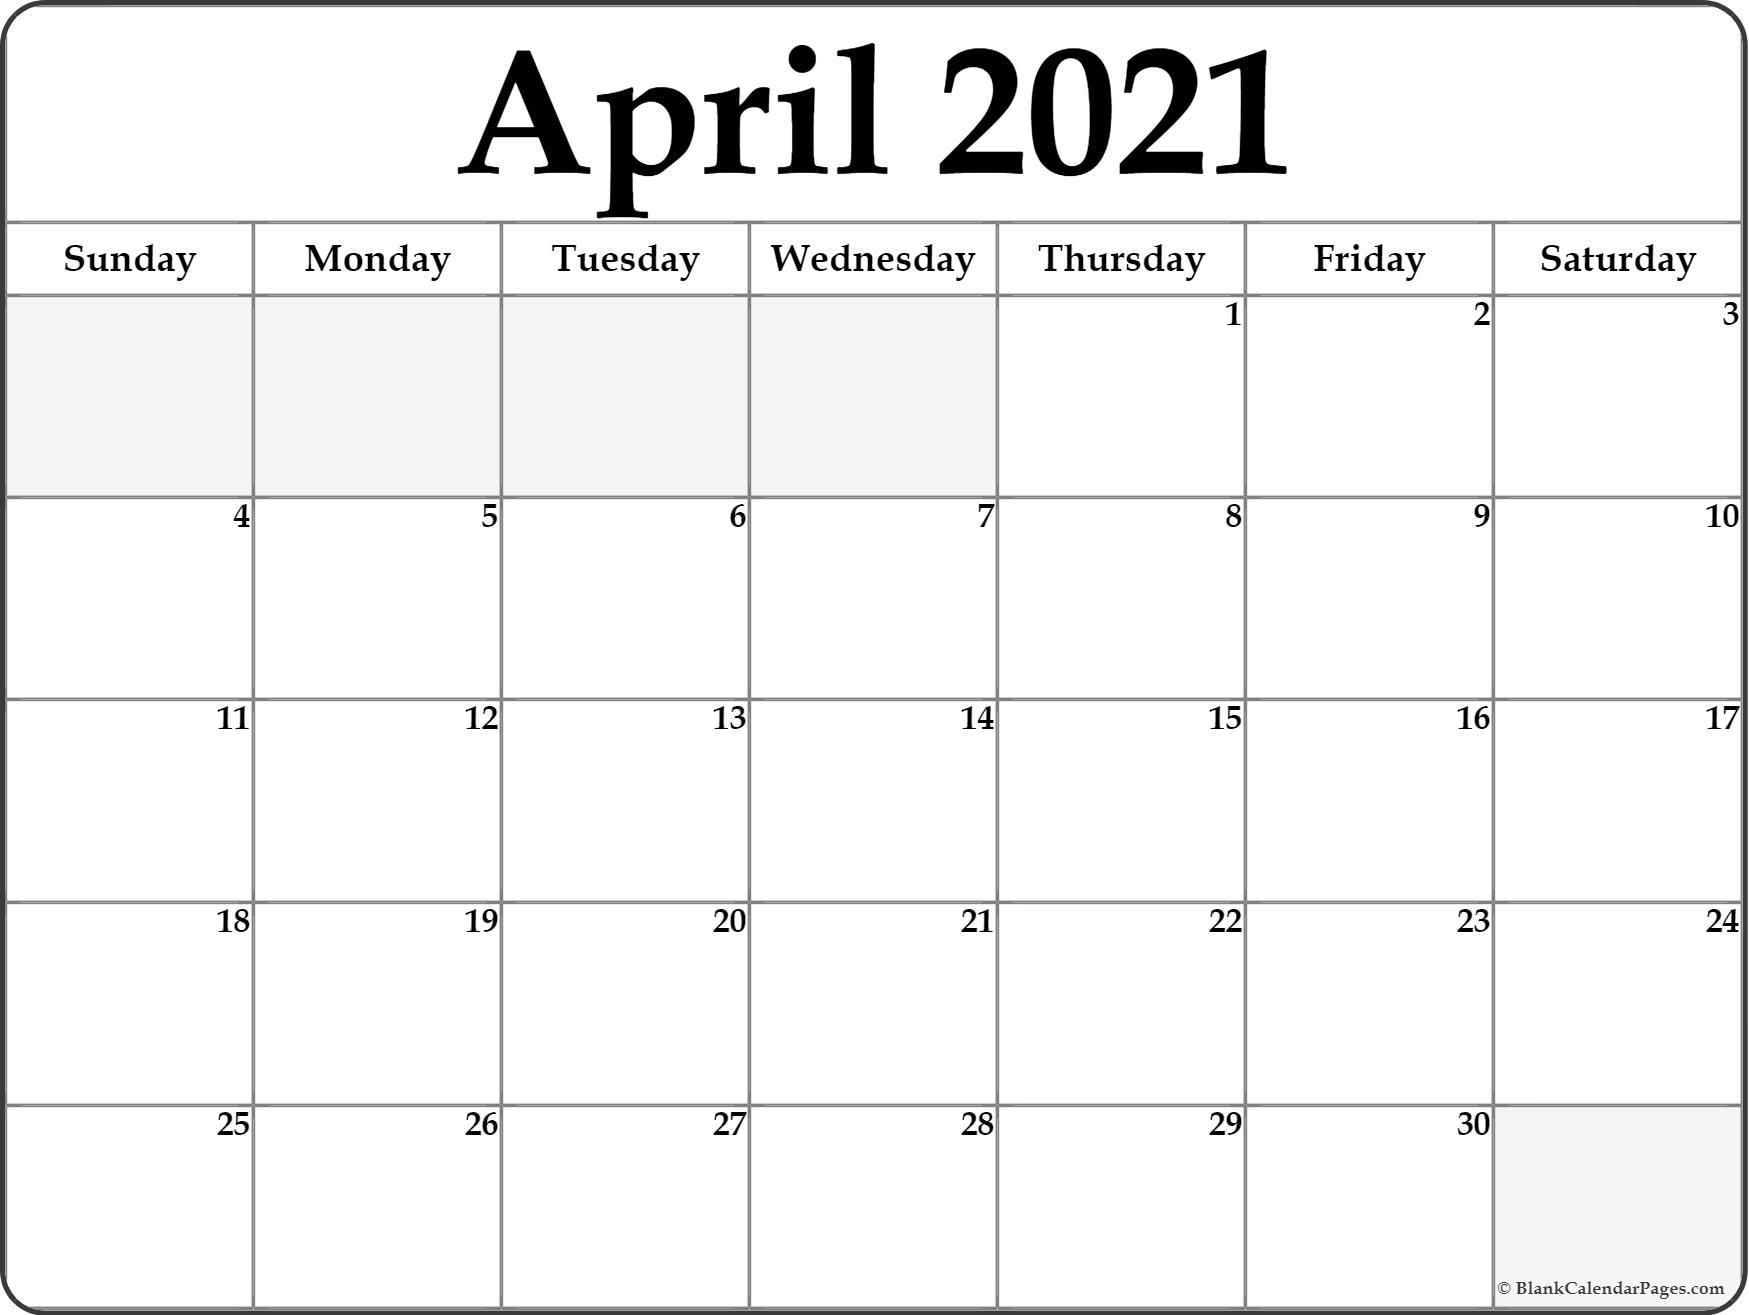 April 2021 Calendar Free Printable Monthly Calendars 1